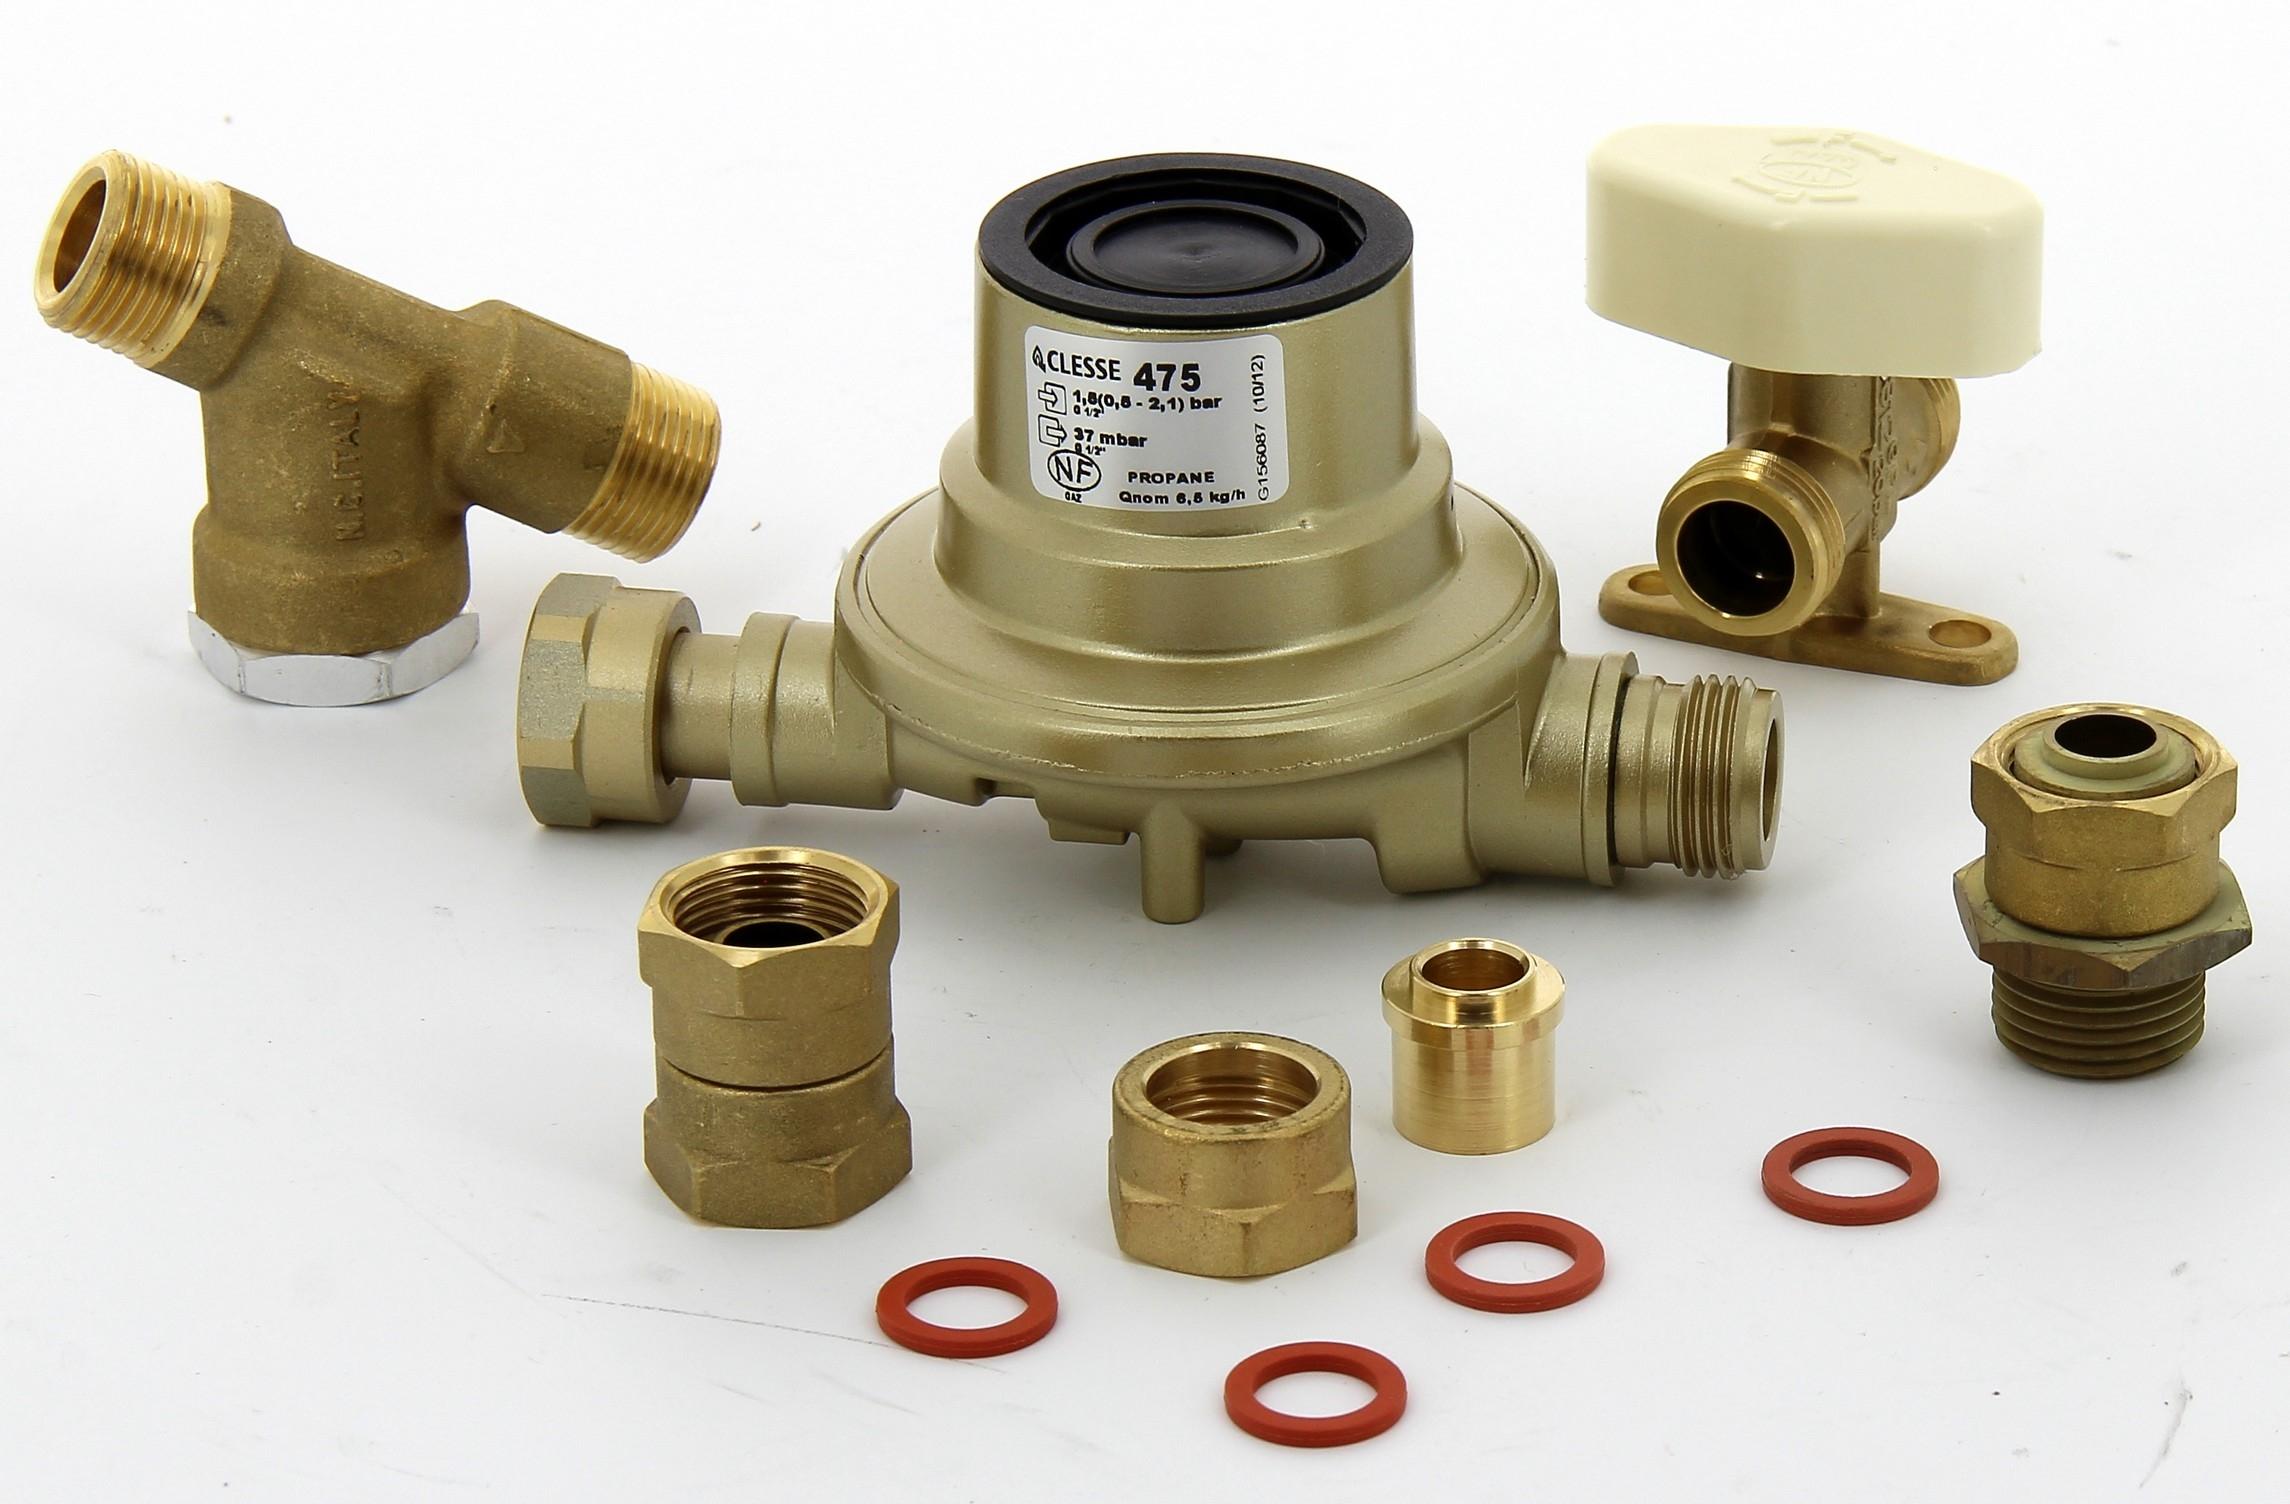 kit gaz propane comprenant 1 detendeur 1 5 bar 37mbar pour chauffag. Black Bedroom Furniture Sets. Home Design Ideas